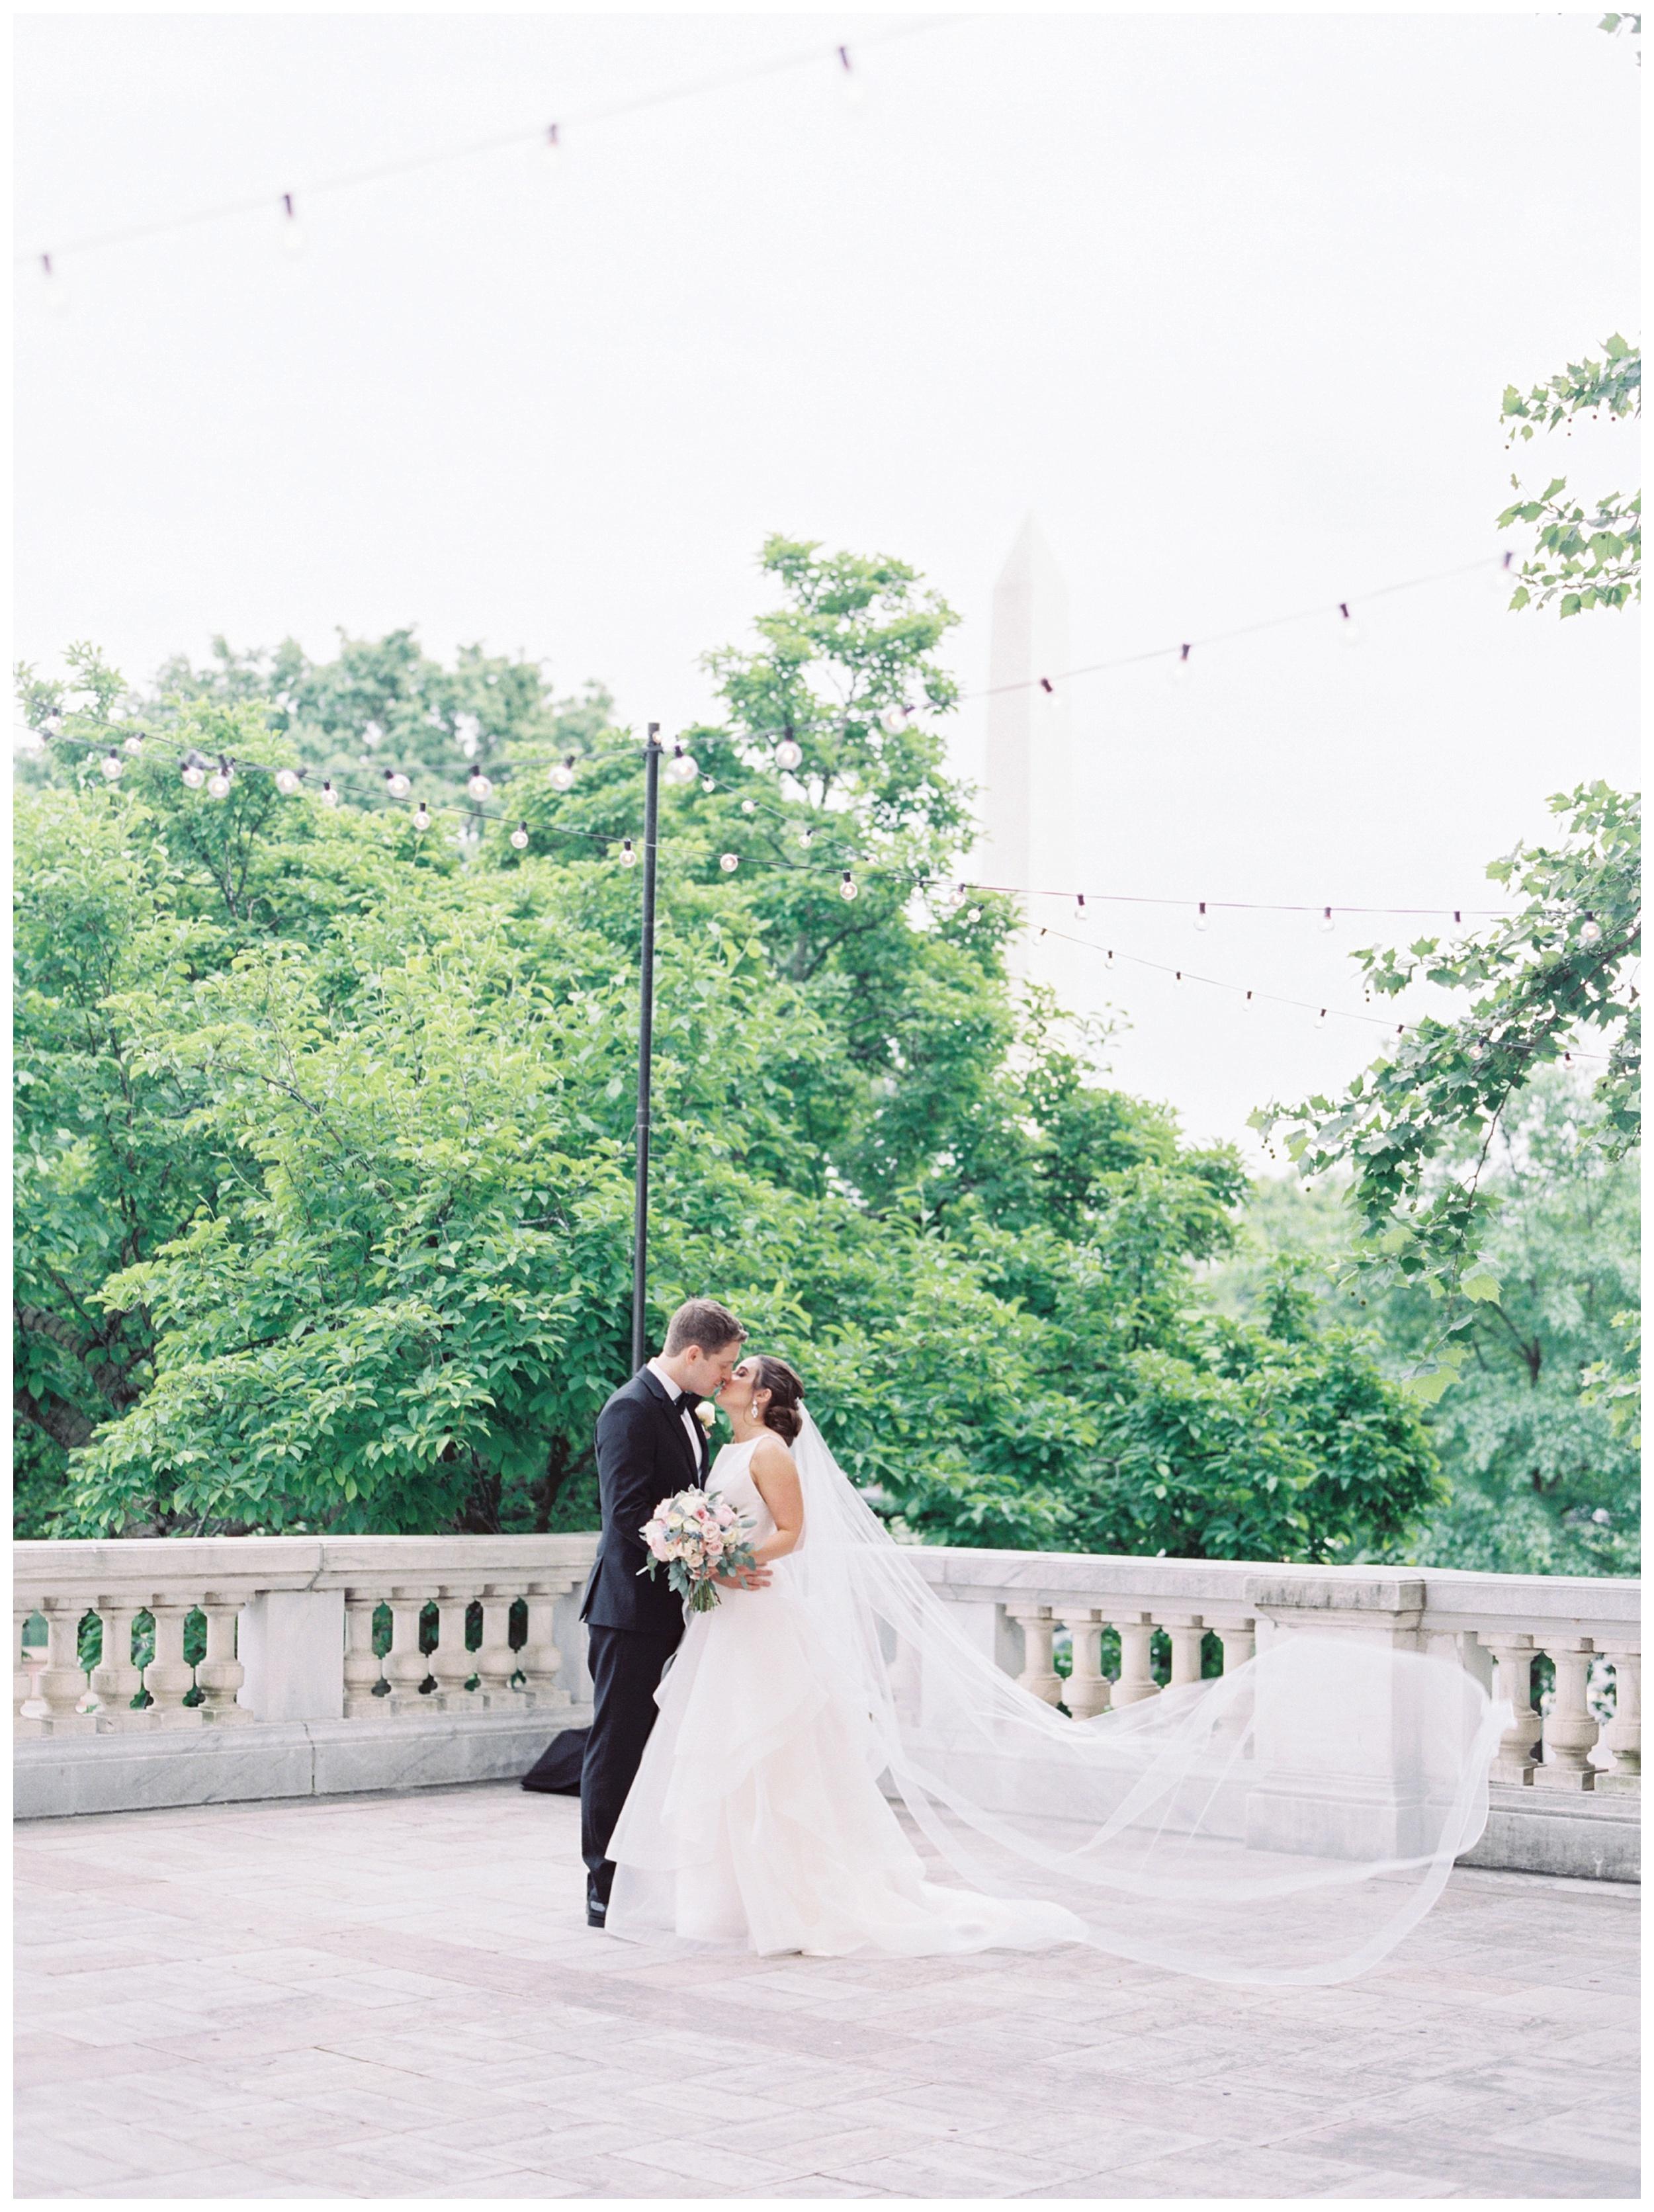 DAR Constitution Hall Wedding Wedding | Daughters of the American Revolution Wedding | District of Columbia Film Wedding Photographer Kir Tuben_0092.jpg